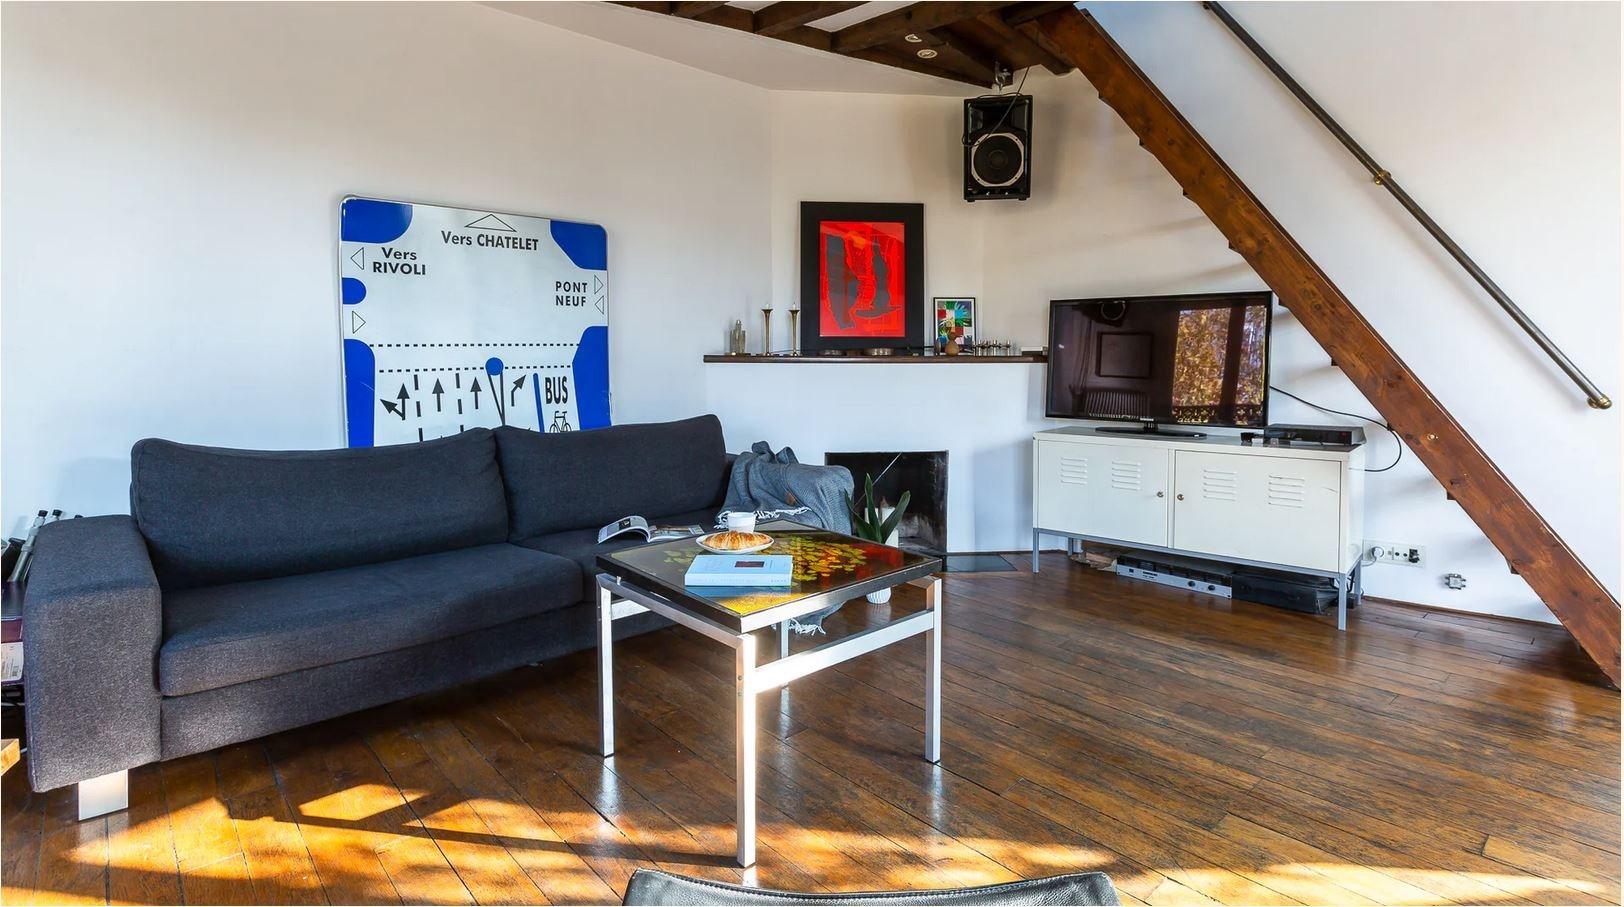 Duplex on the last floor 81.43m² (62.41m² Law Carrez) – Balcony of 11.5m² 2